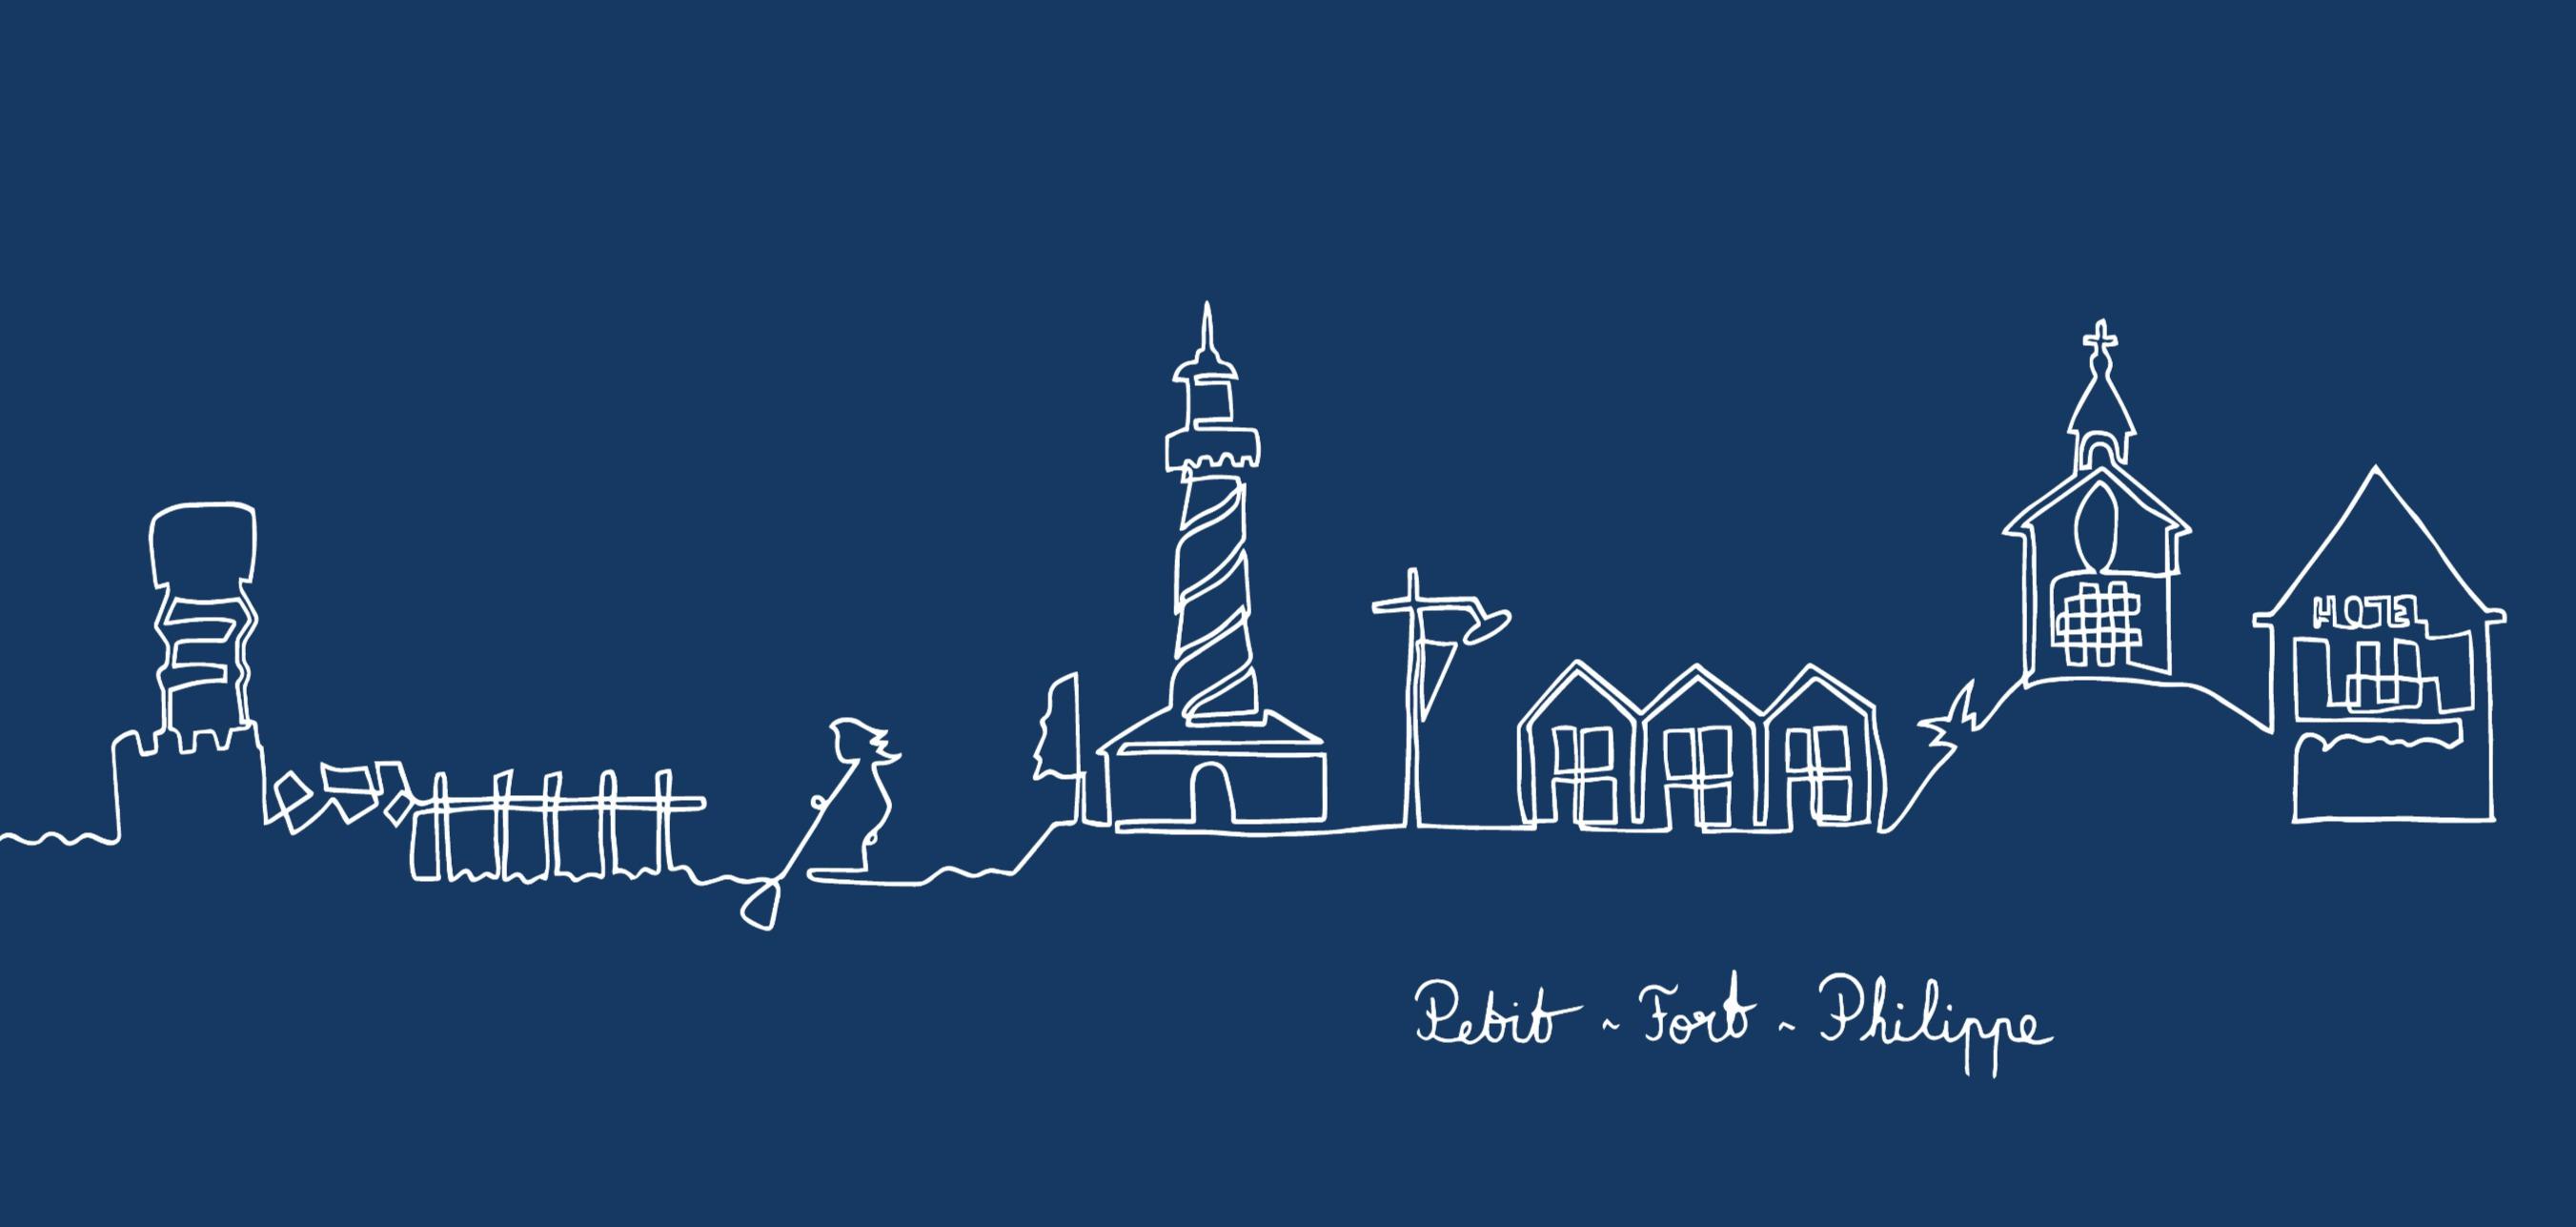 Bleu - Petit-Fort-Philippe